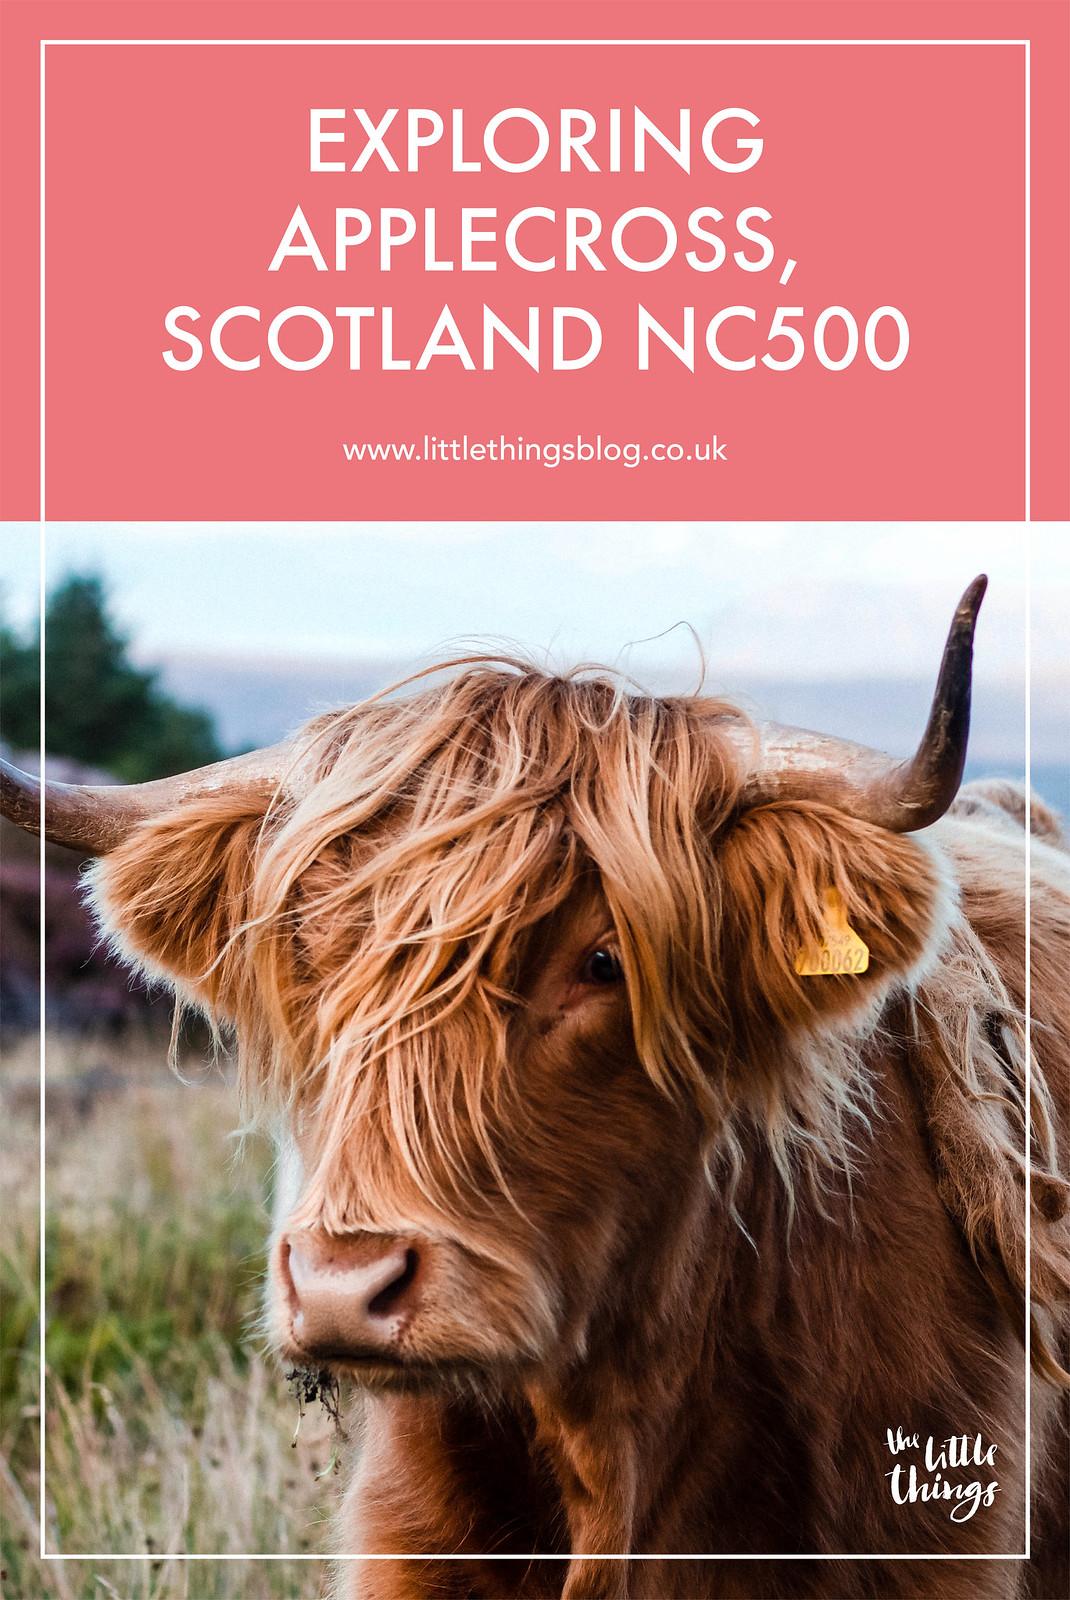 Exploring Applecross Peninsula Scotland NC500